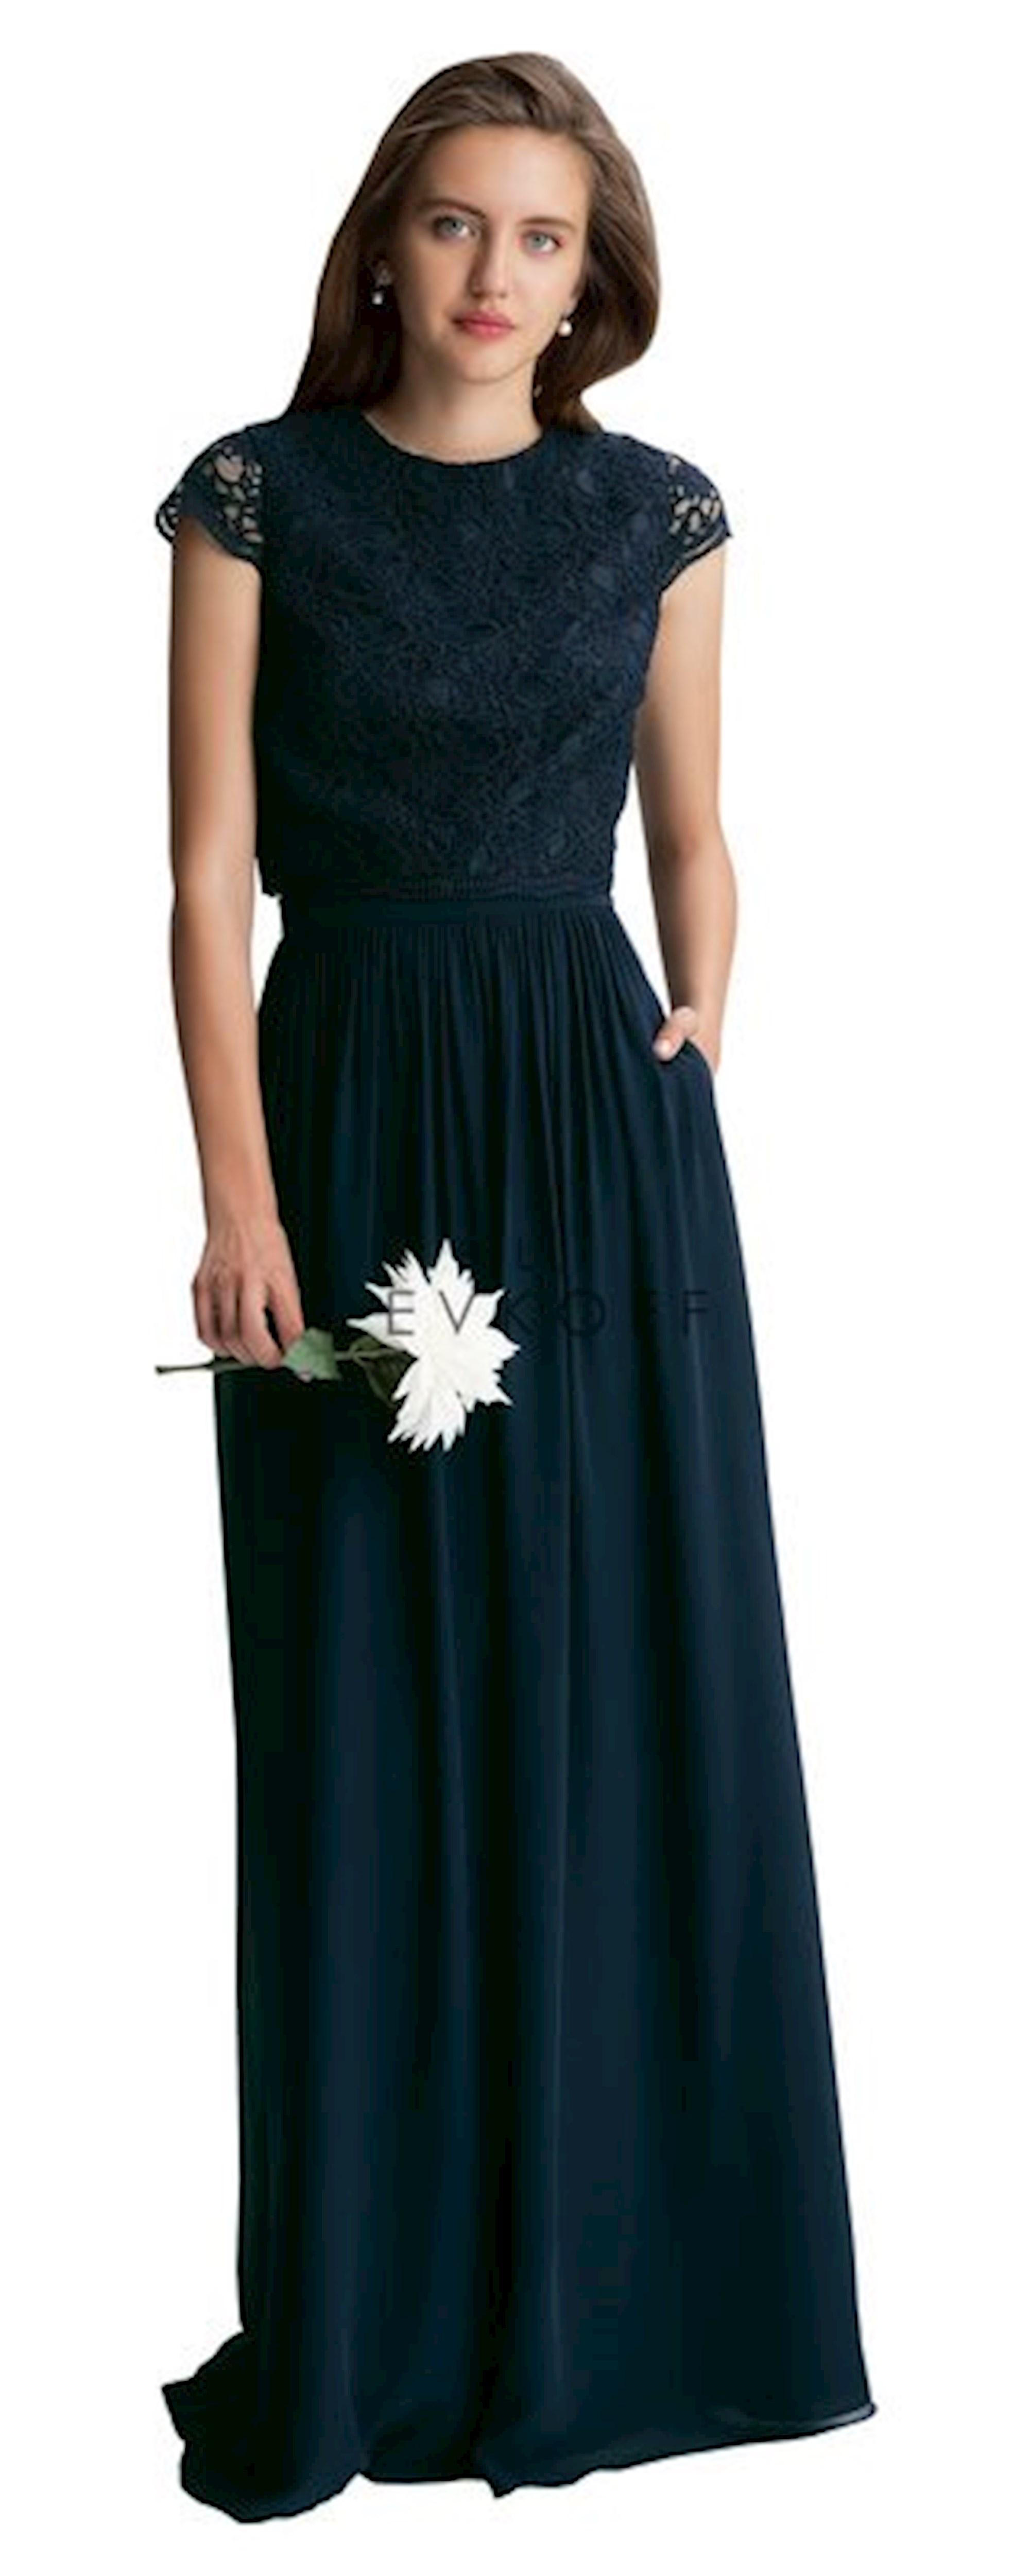 d476bc41cdd7 Bill Levkoff Bridesmaids Dresses   Regiss in Kentucky - 1427